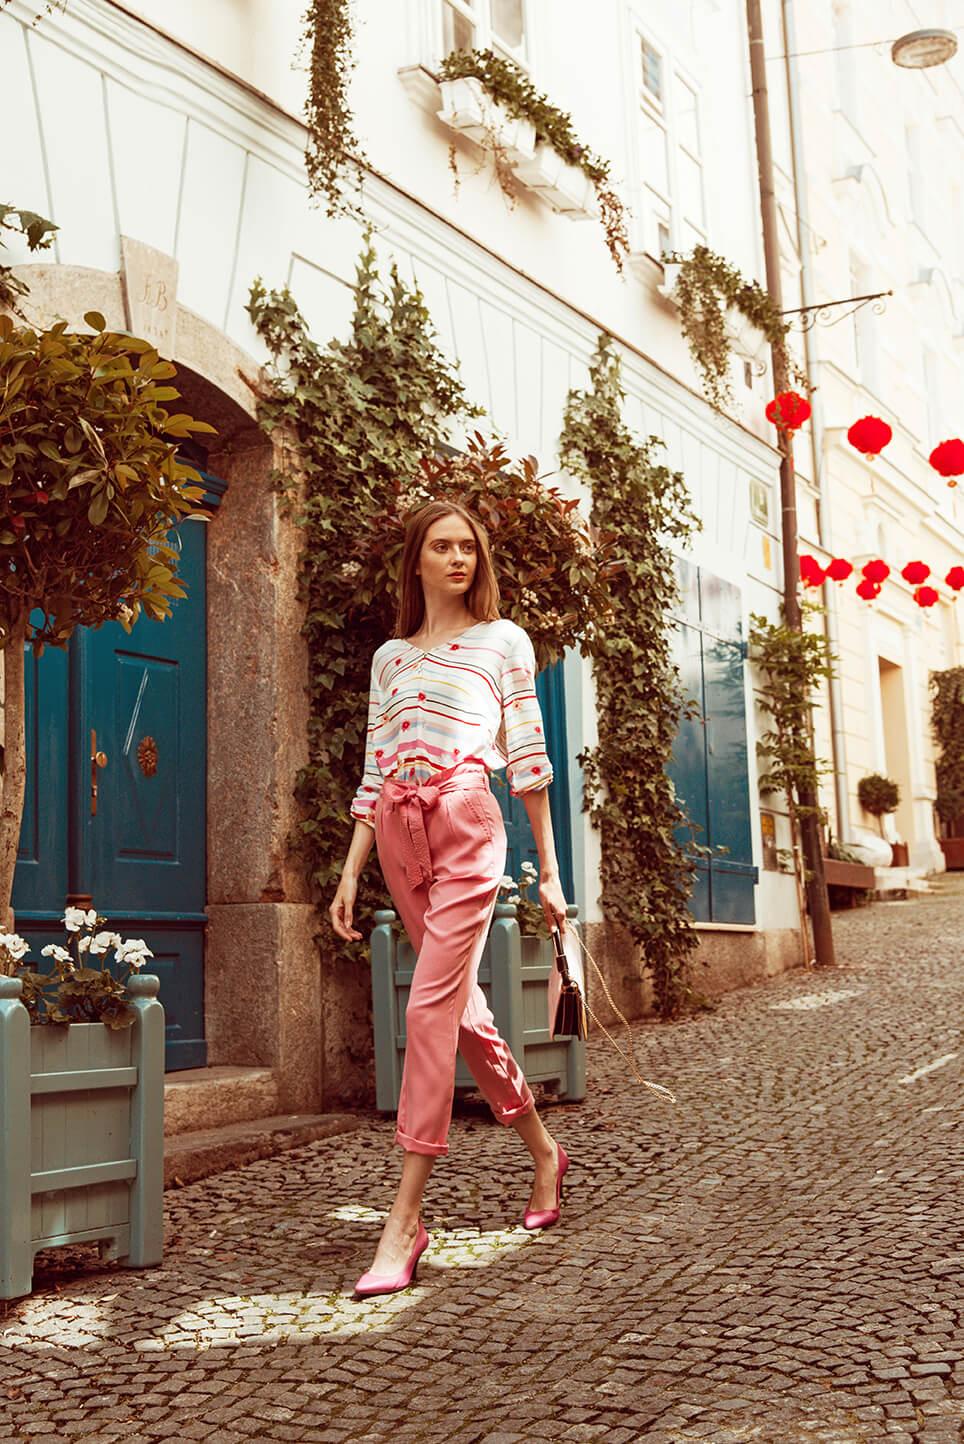 Pantalone Tom Tailor 37,5 EUR, Bluza Tom Tailor 27,5 EUR, Torbica Parfois 27,99 EUR